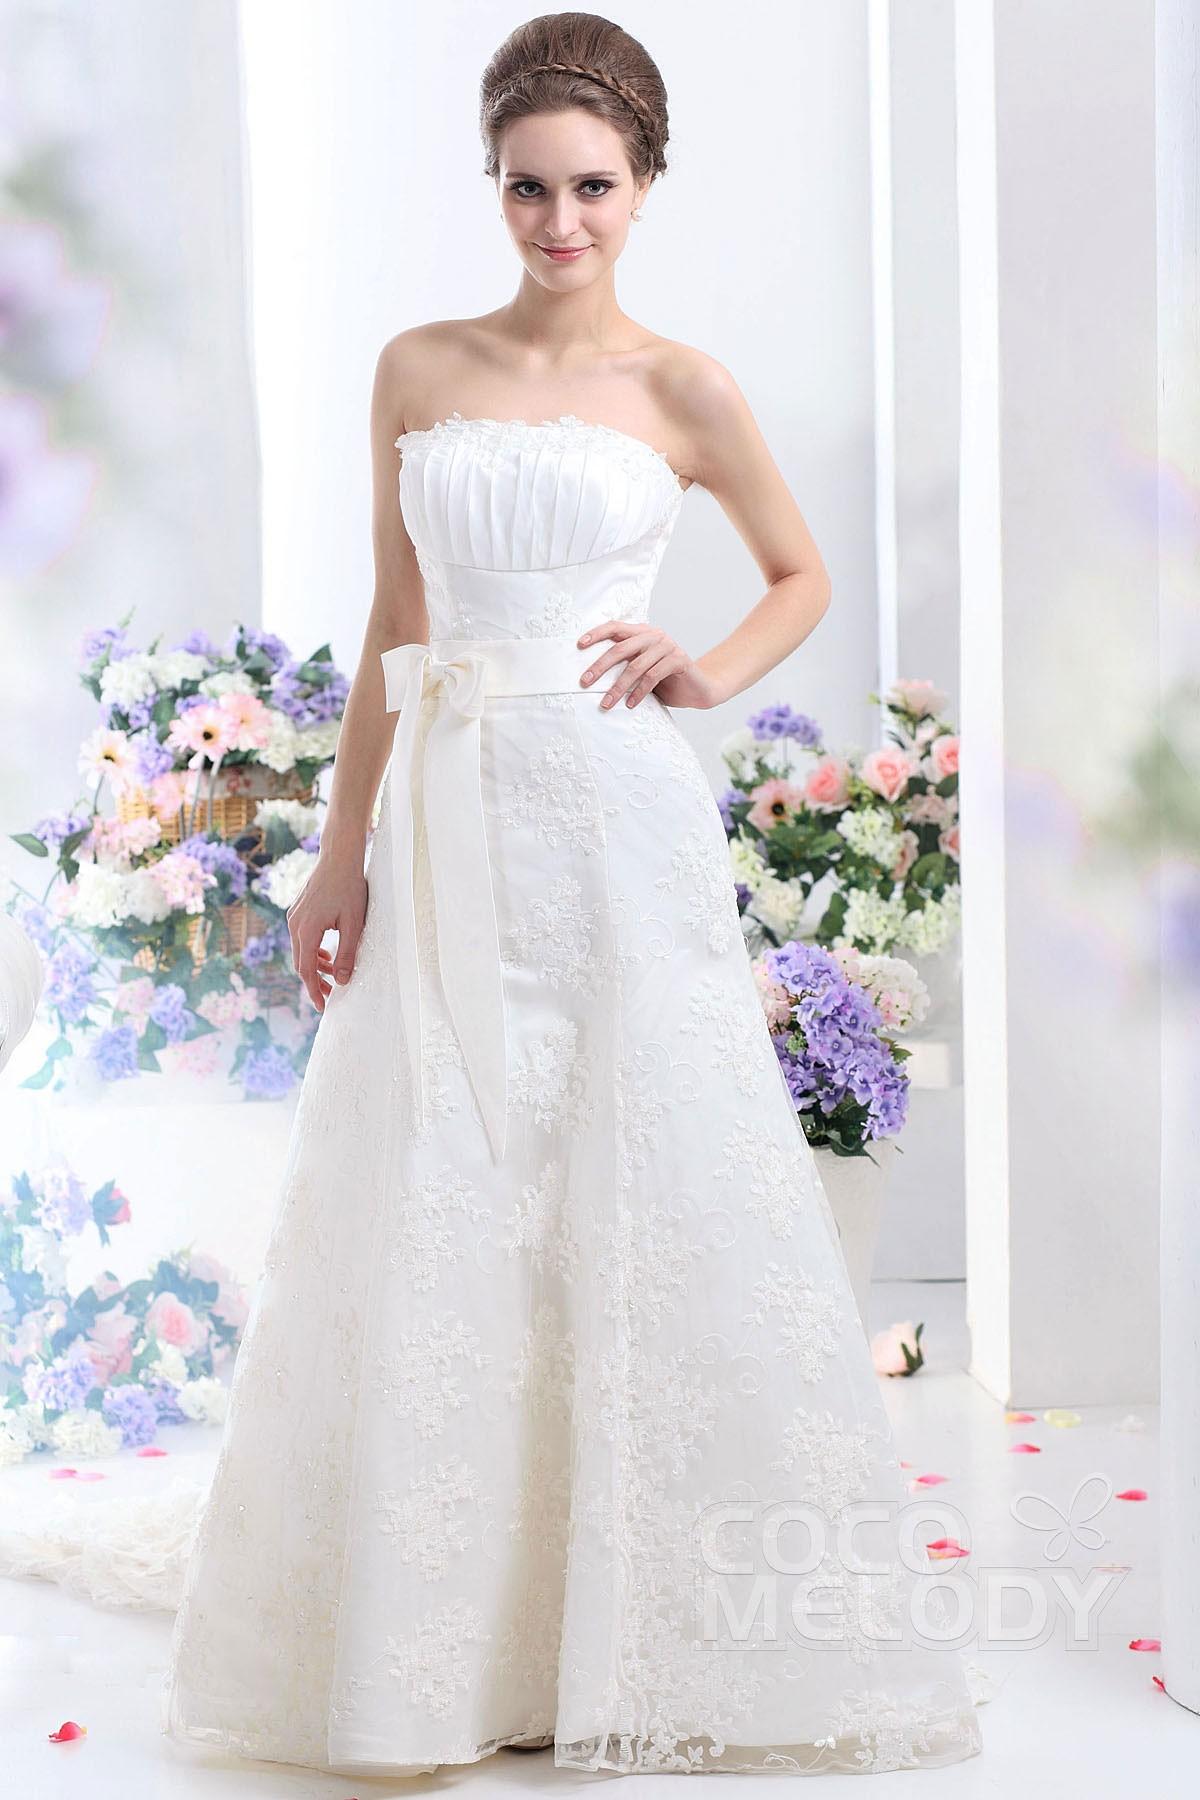 Fairy tale A Line Strapless Court Train Lace Wedding Dress